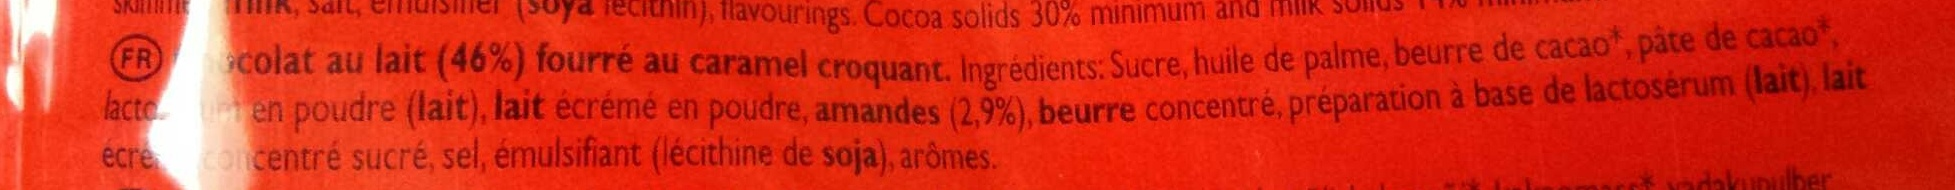 Daim mini chocolate pieces milk with caramel crunch - Ingredients